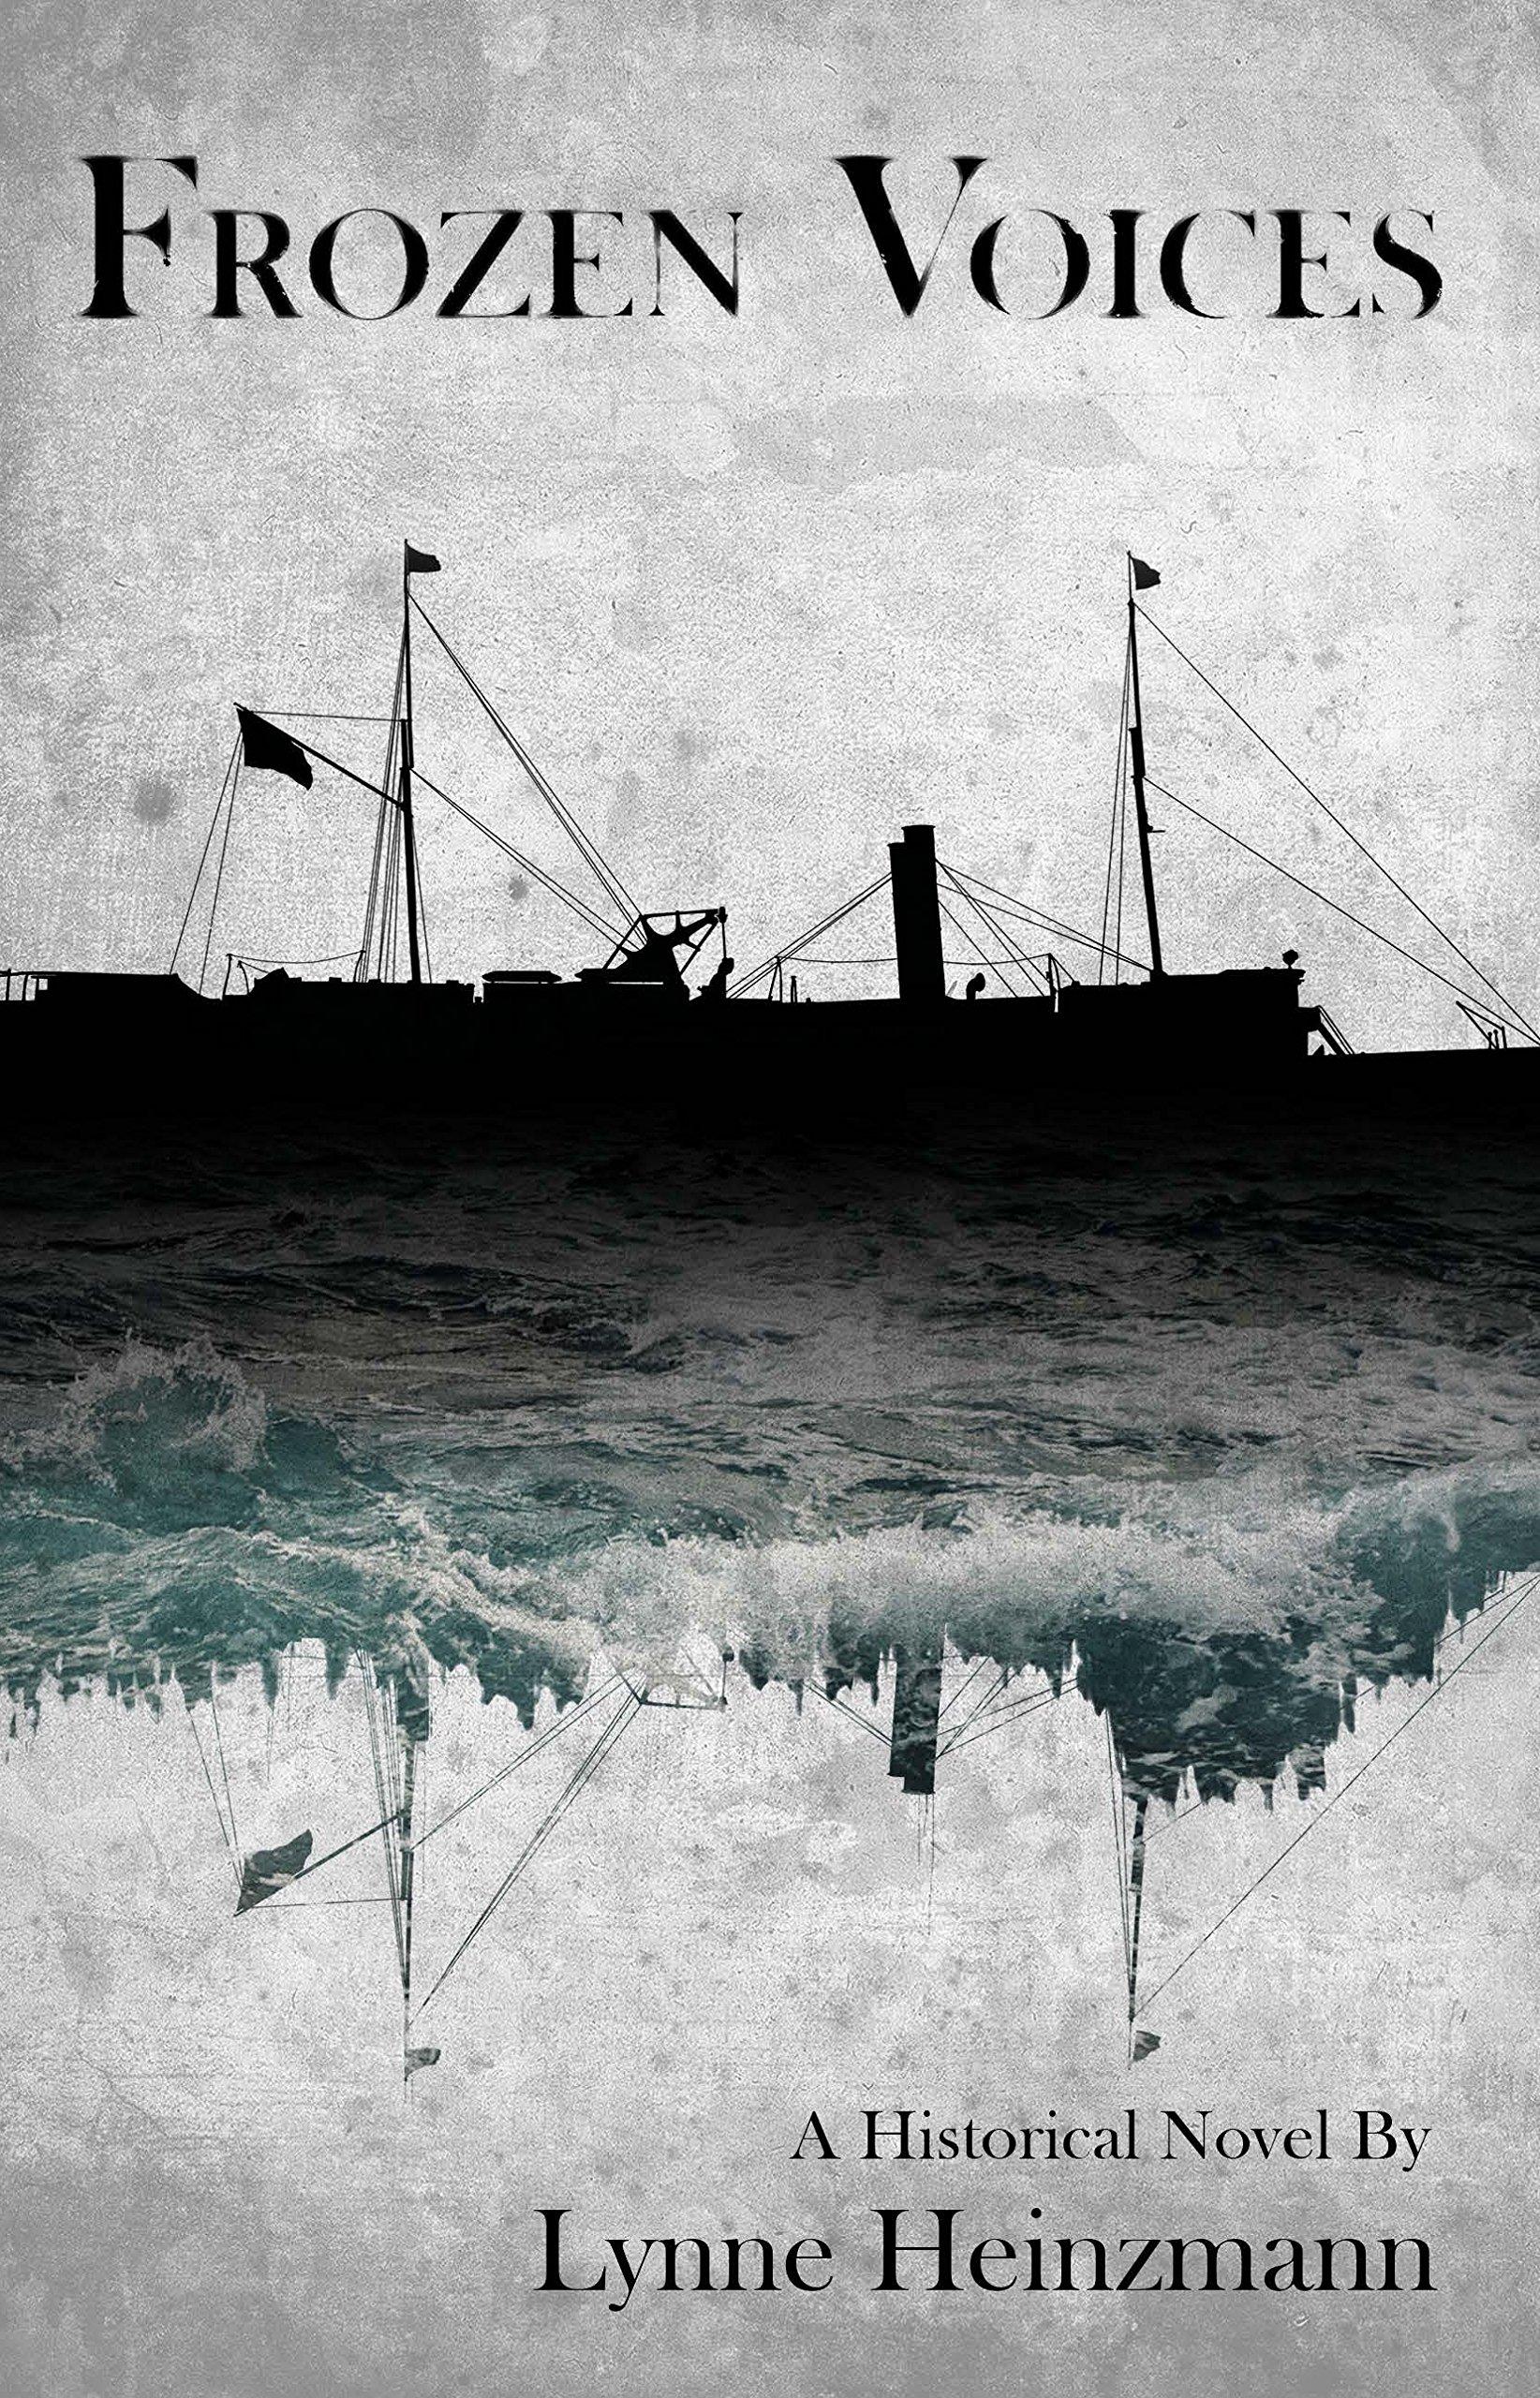 Image result for frozen voices novel